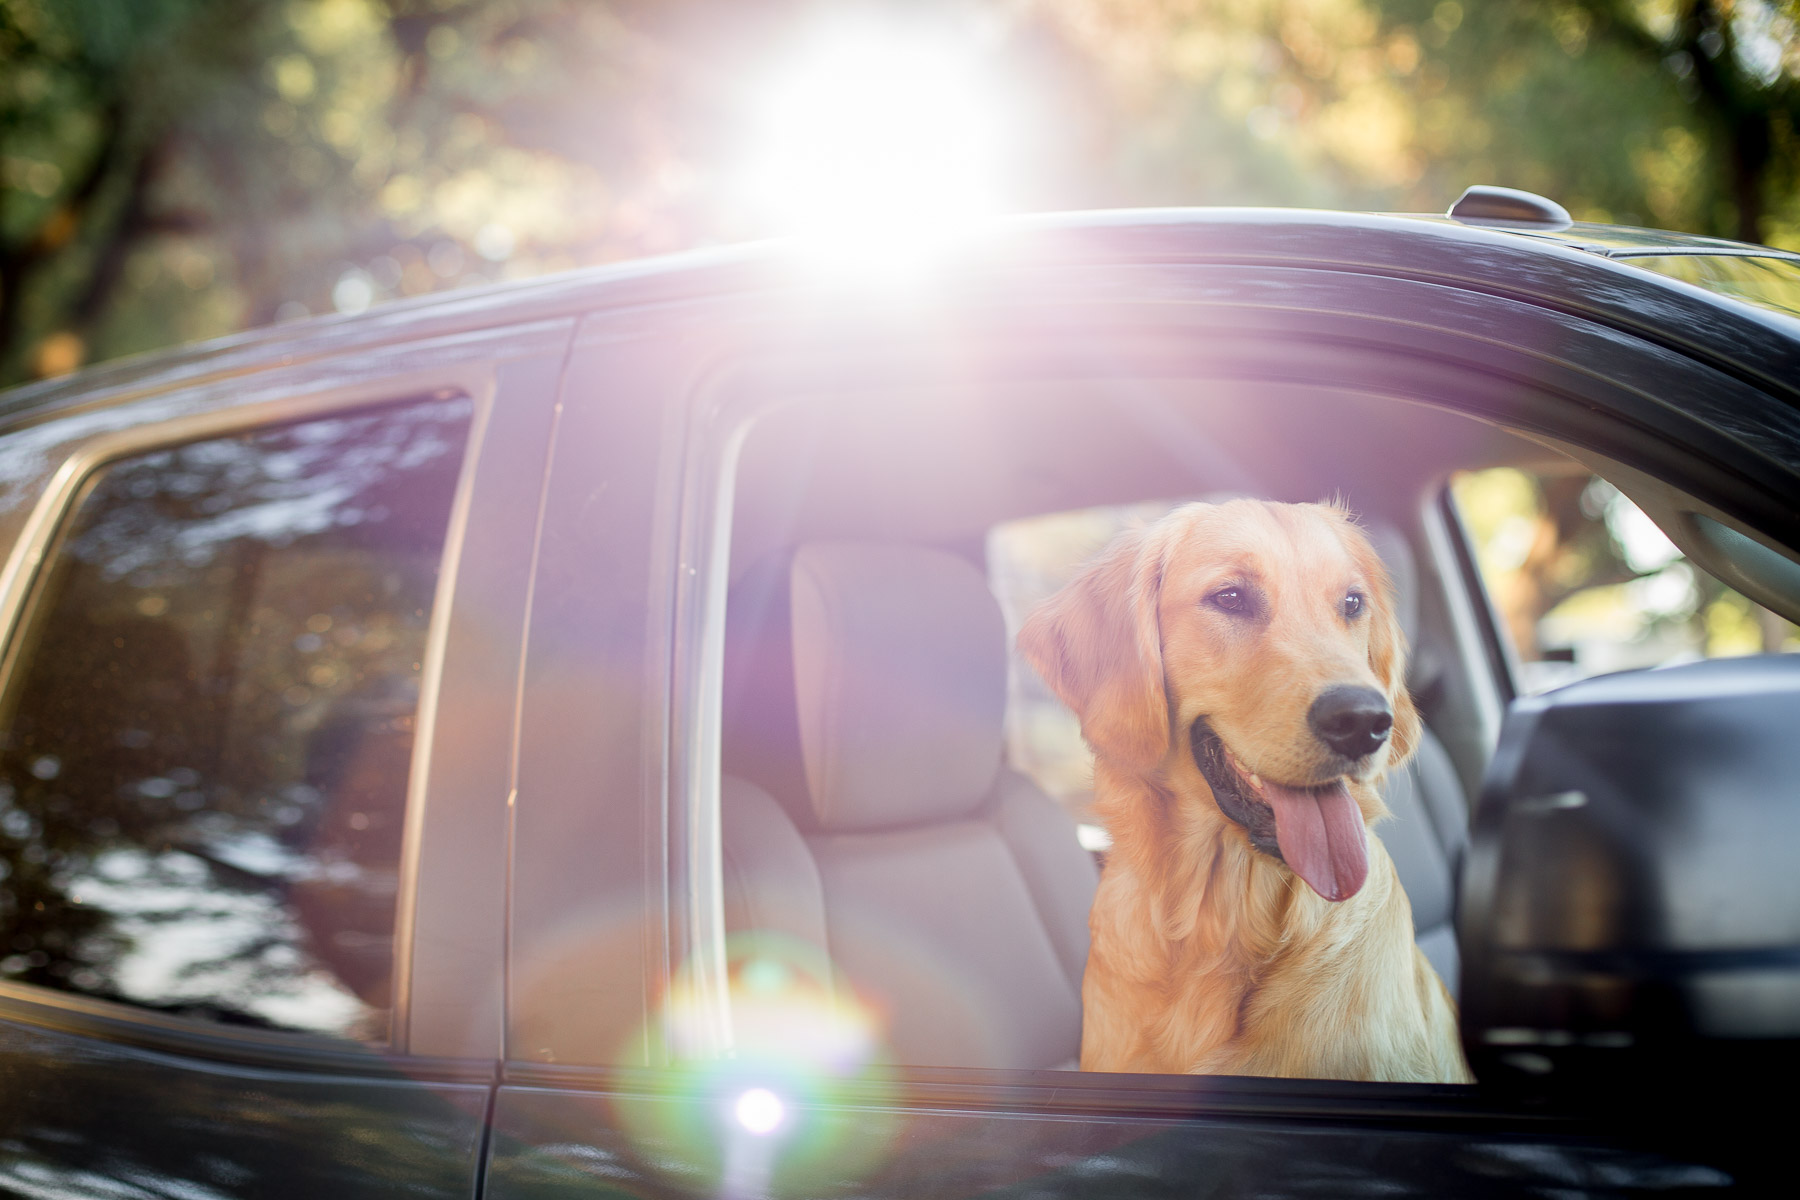 dog-golden-retriever-puppy-head-out-window-car-dog-photography.jpg